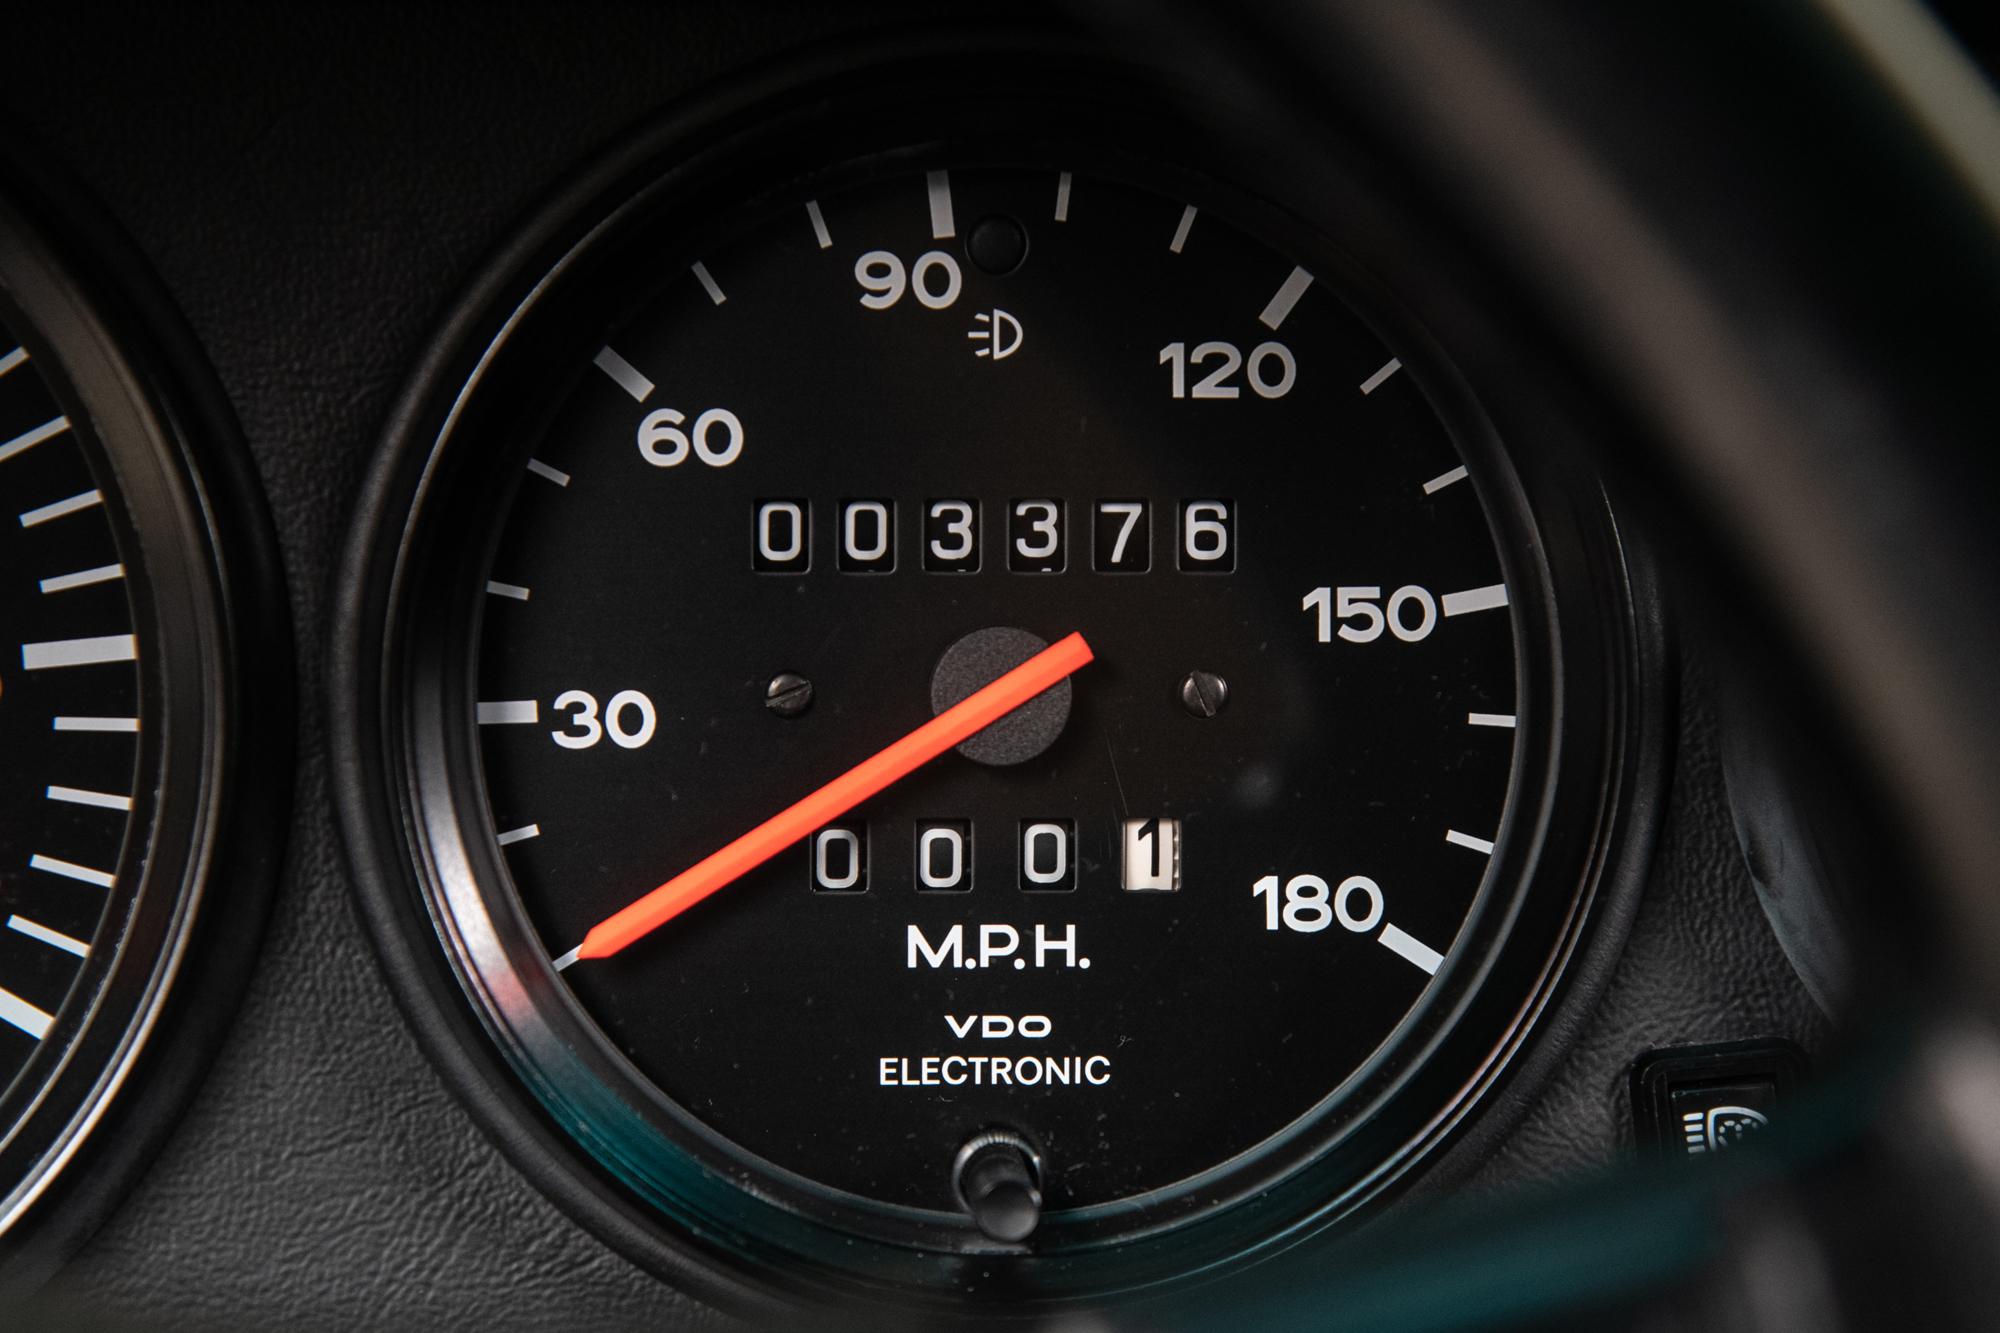 1986 Porsche 911 Turbo Slantnose, WHITE, VIN WP0ZZZ93ZGS000695, MILEAGE 3376